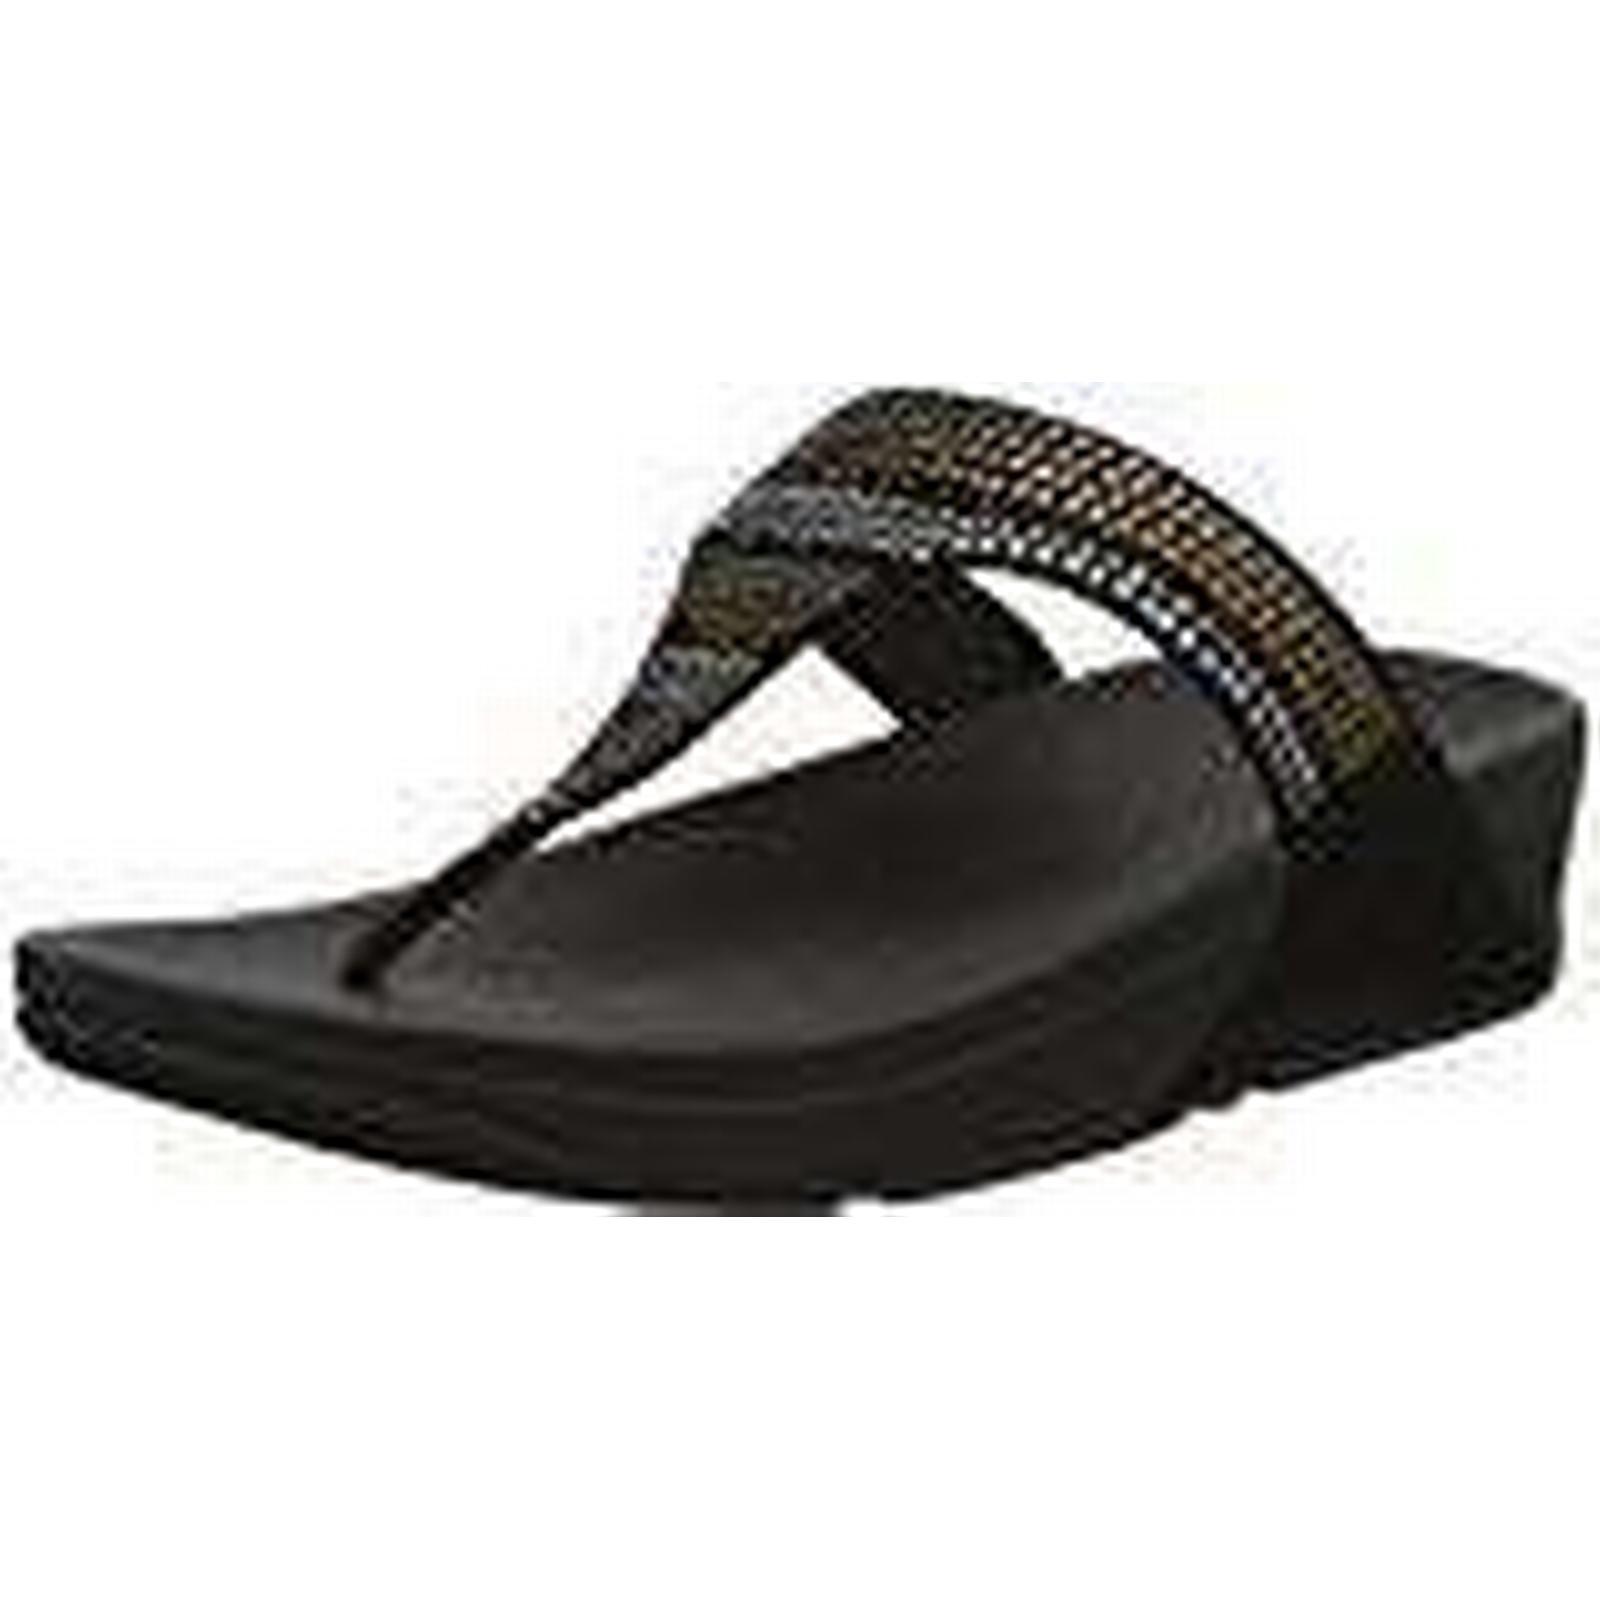 Fitflop Women's Strobe Luxe Toe-Thong UK Sandals Open (Black), 3 UK Toe-Thong 36 EU 89151a